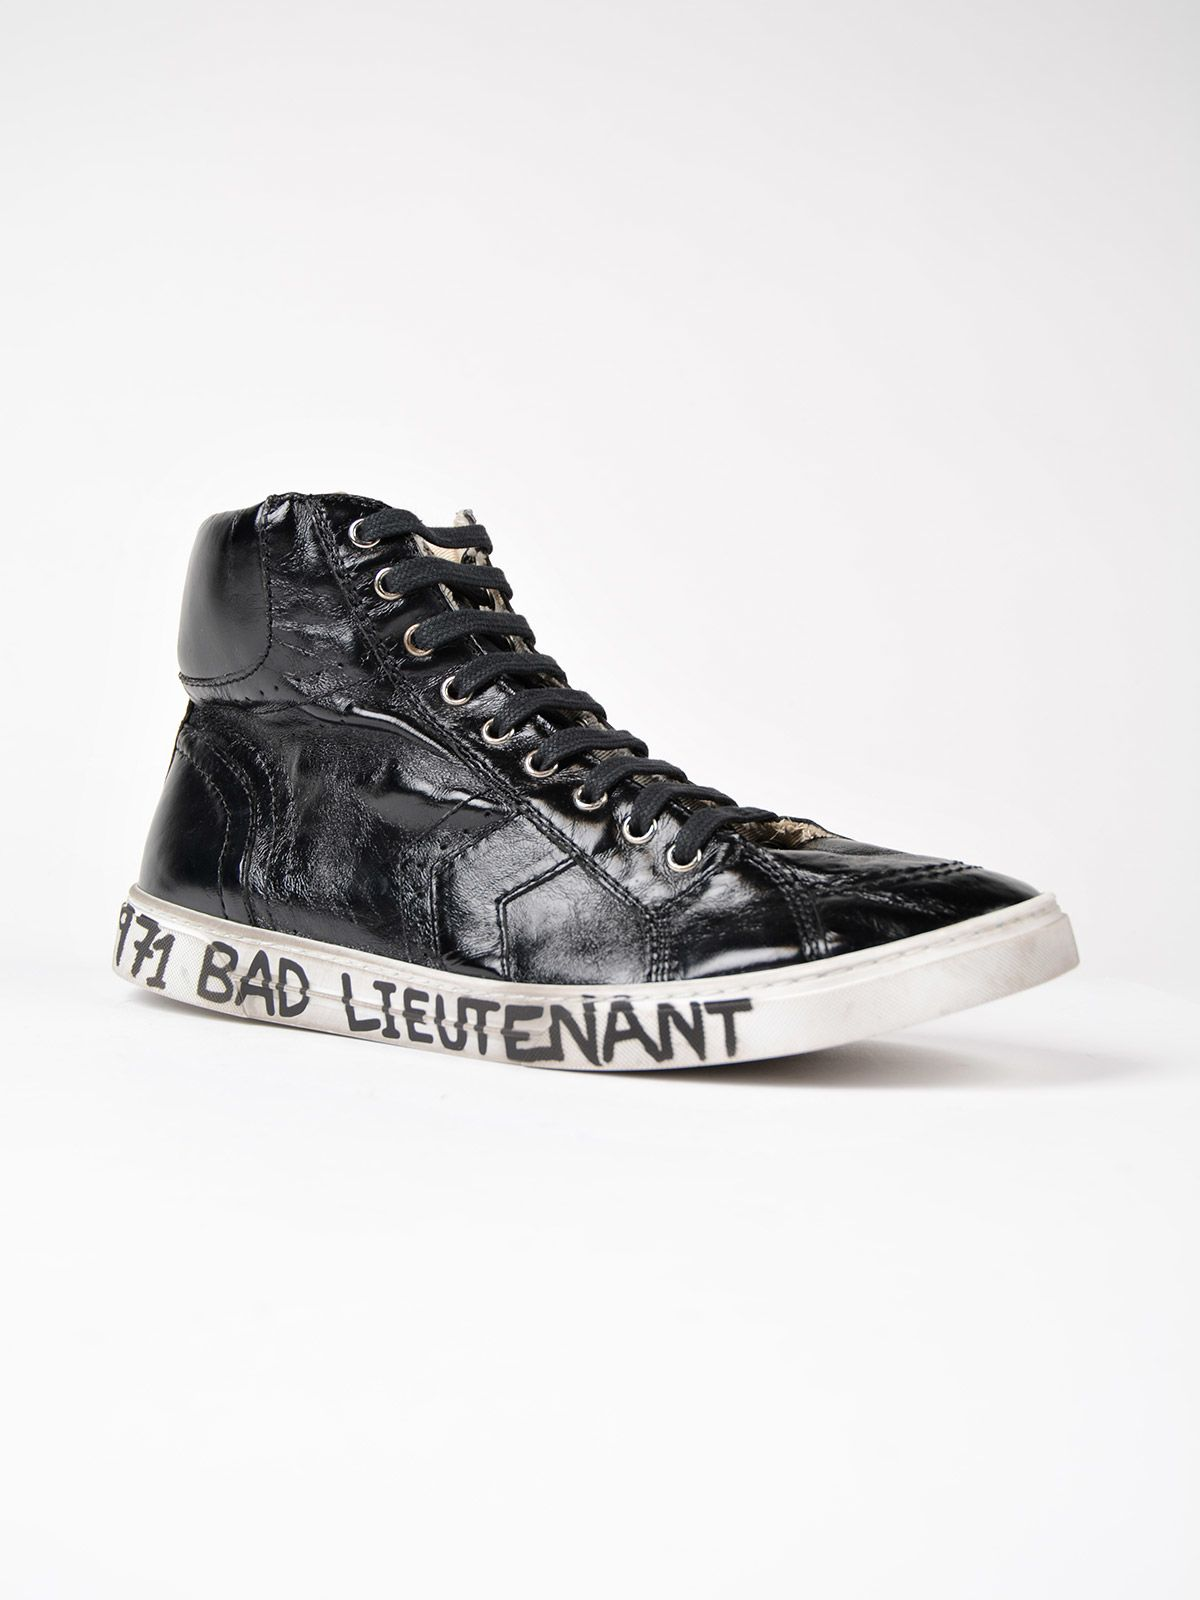 saint laurent saint laurent bad lieutenant hi top sneakers black men 39 s sneakers italist. Black Bedroom Furniture Sets. Home Design Ideas